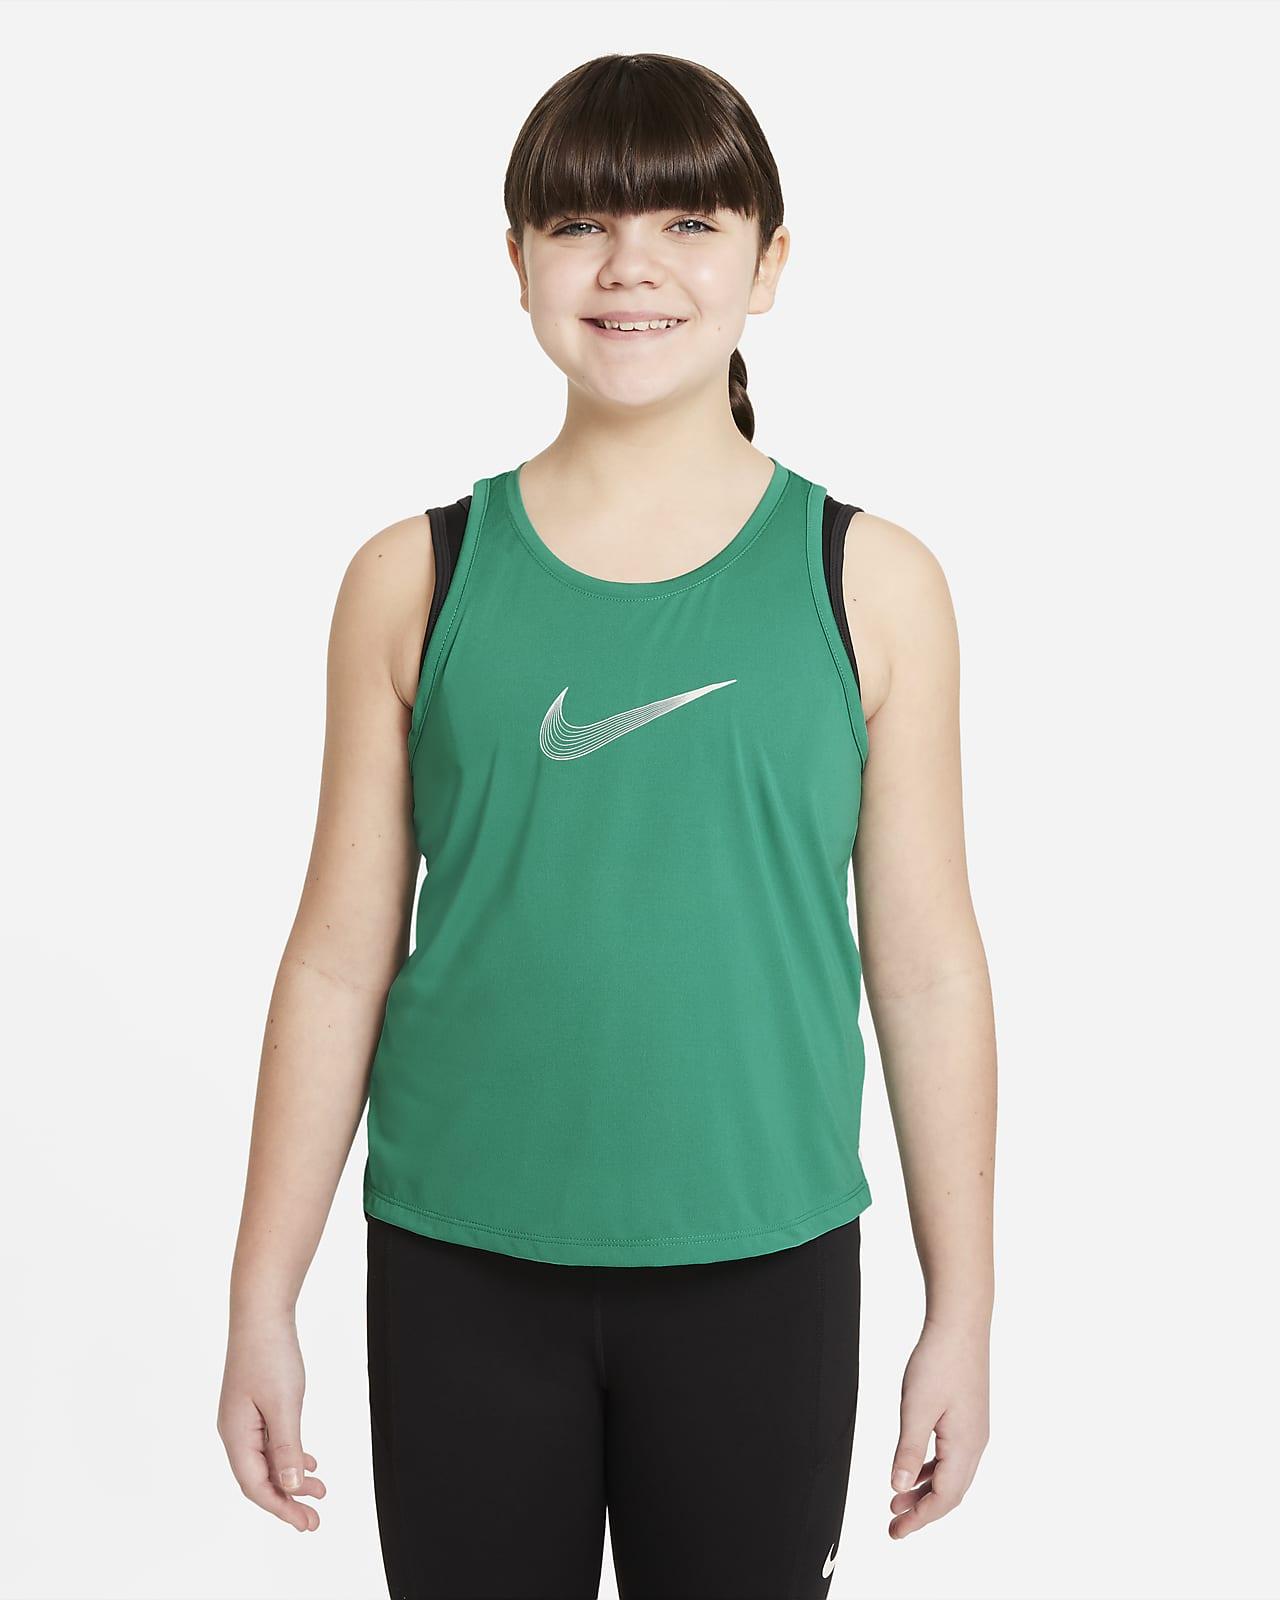 Camiseta de tirantes de entrenamiento para niñas talla grande Nike Dri-FIT Trophy (talla extendida)